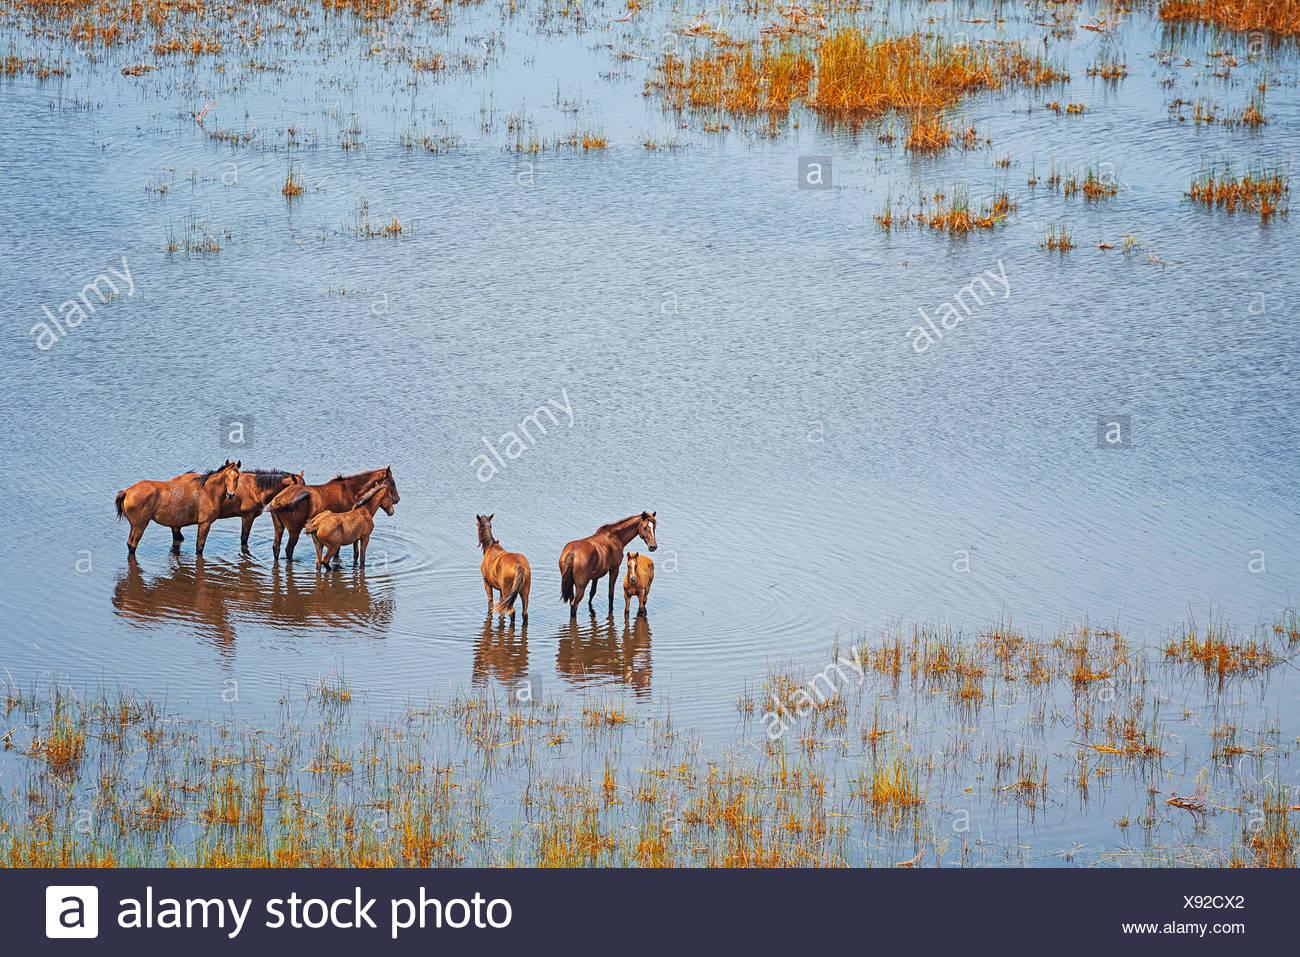 Wild horses in a wet field, Broome, Australia Stock Photo